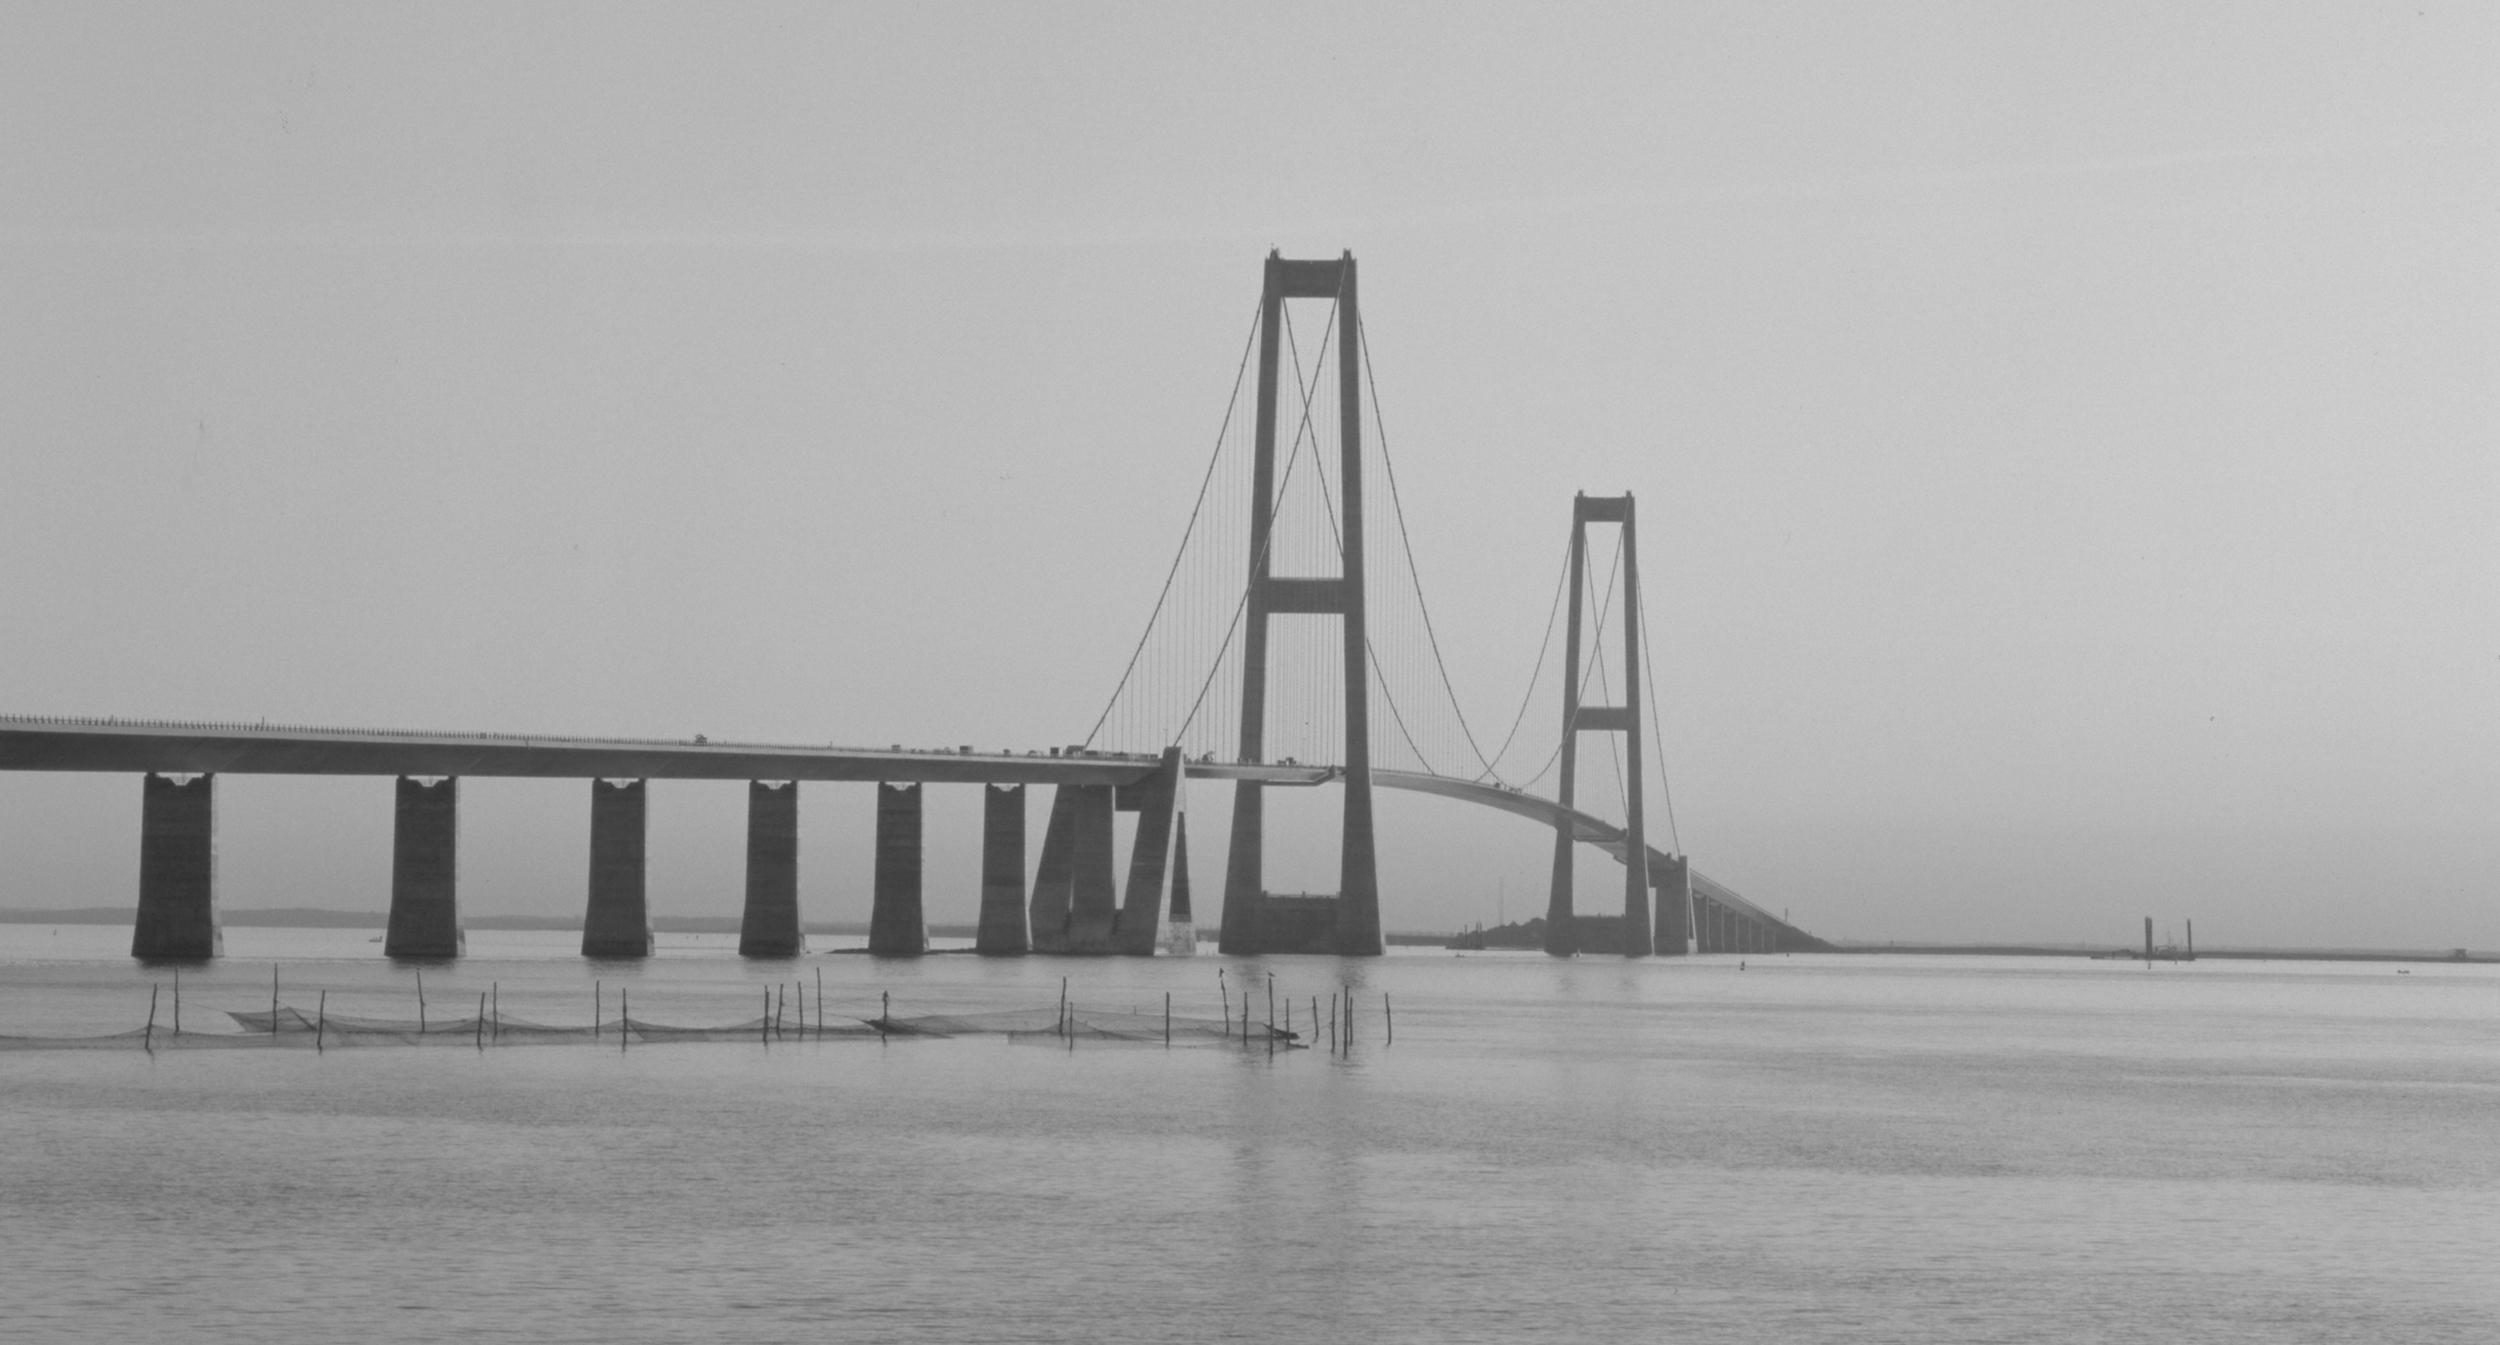 European Award for Steel Structures, ECCS 1999   For the  Great Belt Link's  east bridge.